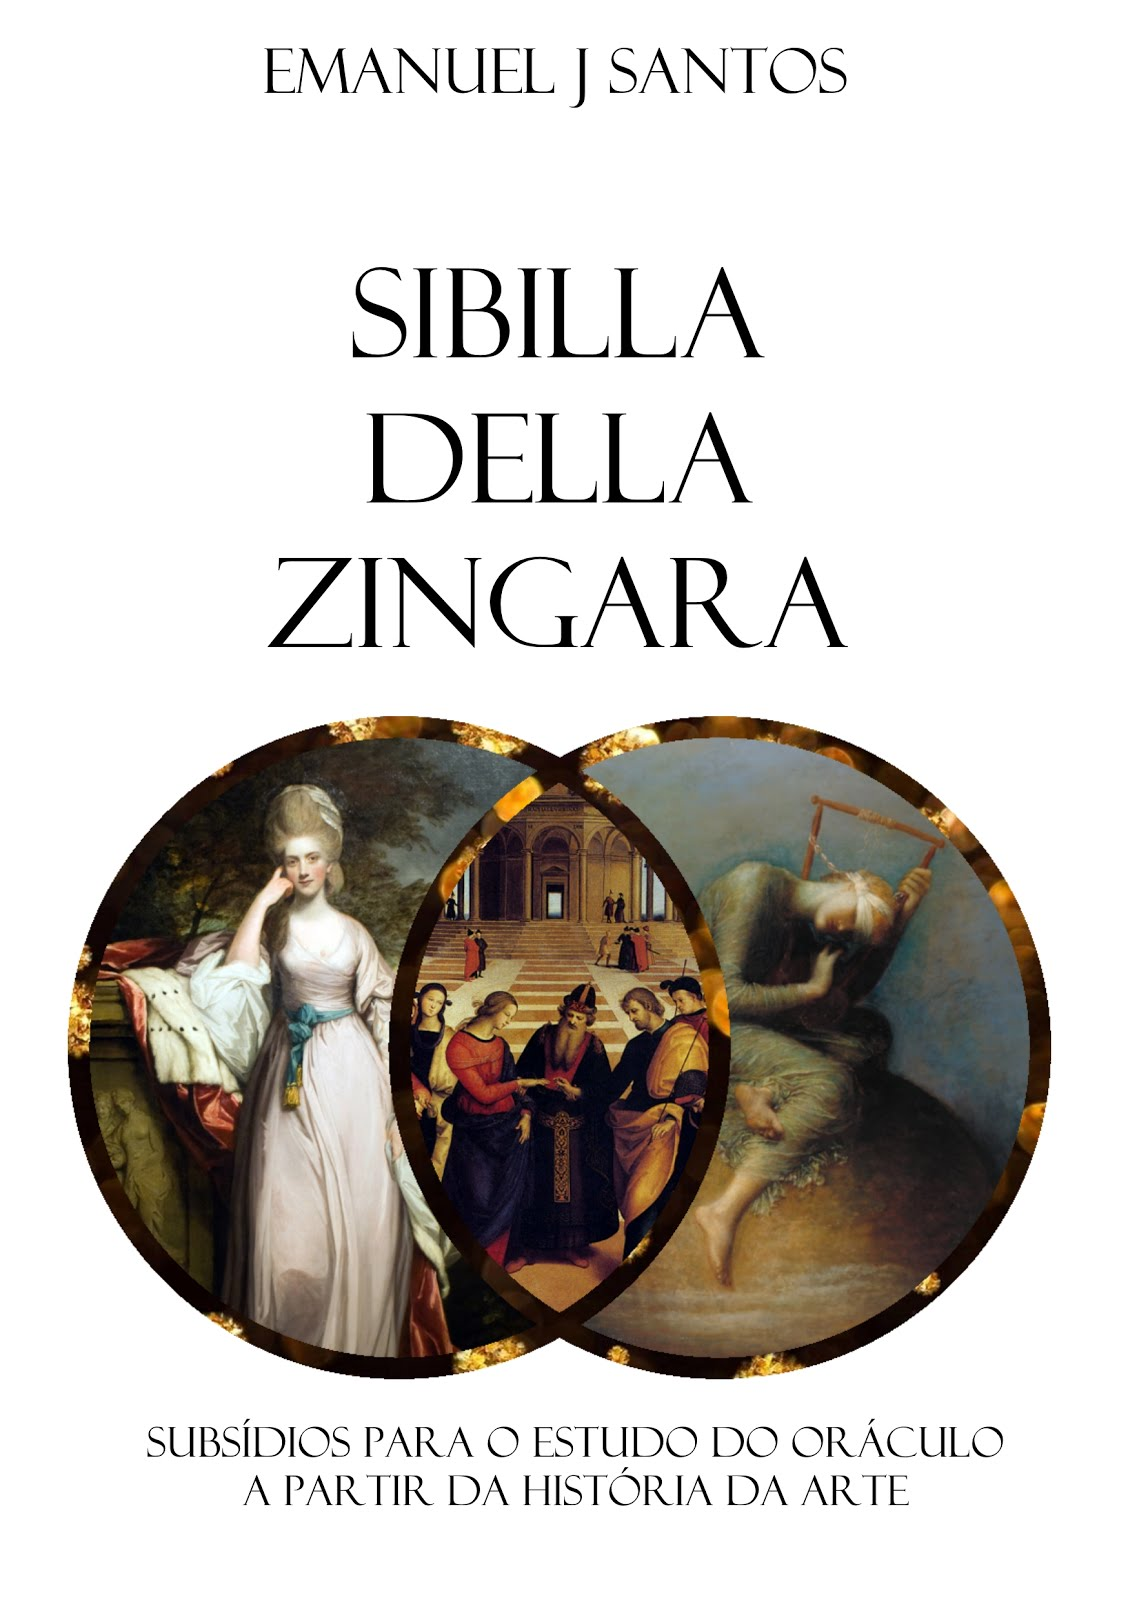 Compre o livro Sibilla Della Zingara